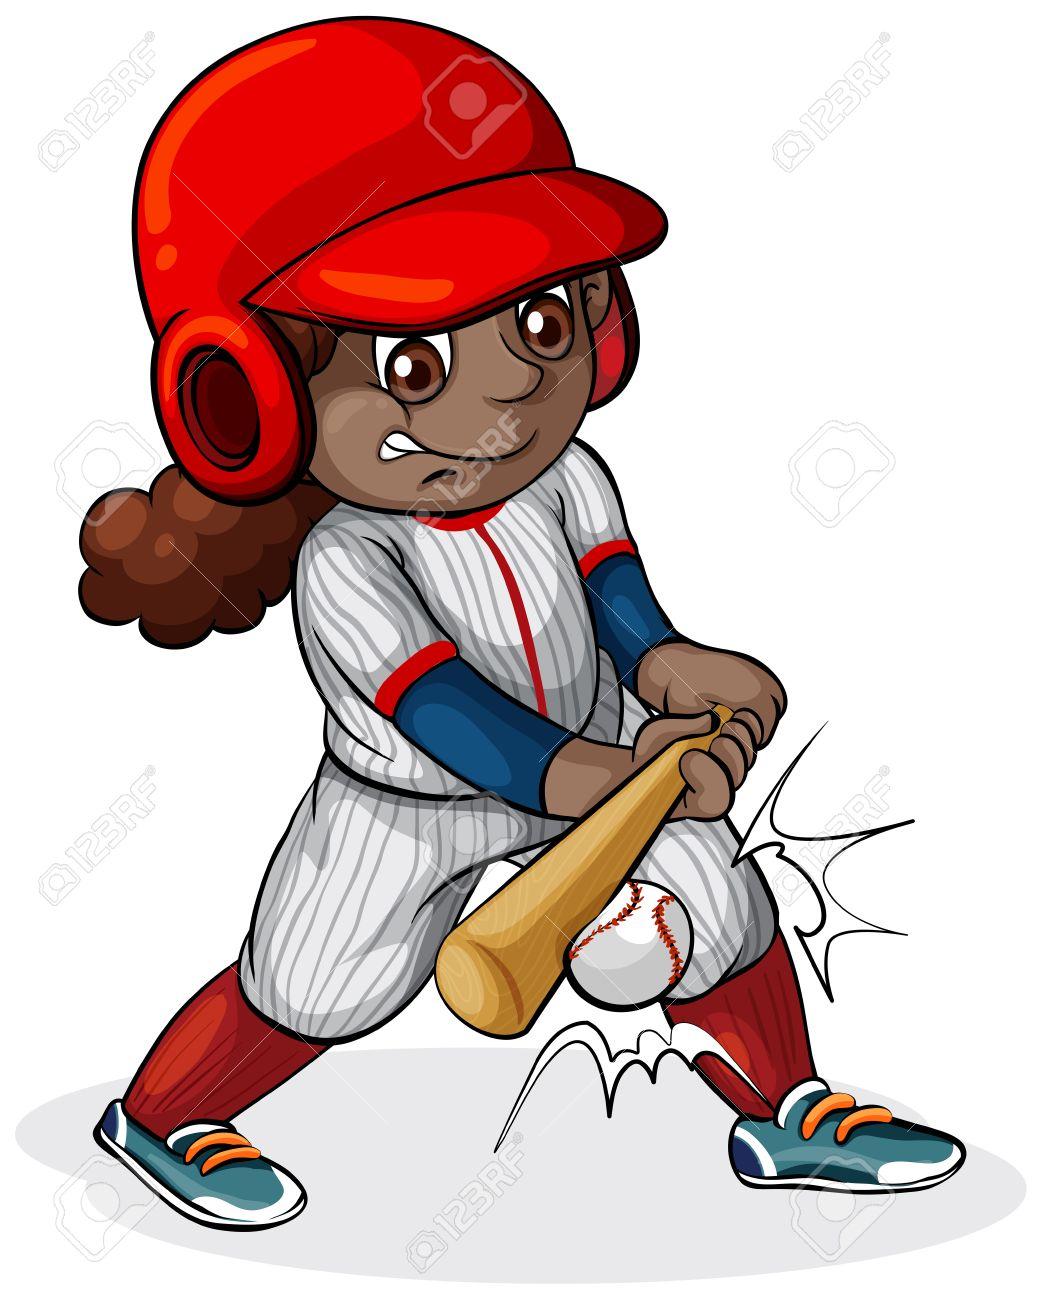 1041x1300 1,712 Baseball Girl Stock Illustrations, Cliparts And Royalty Free